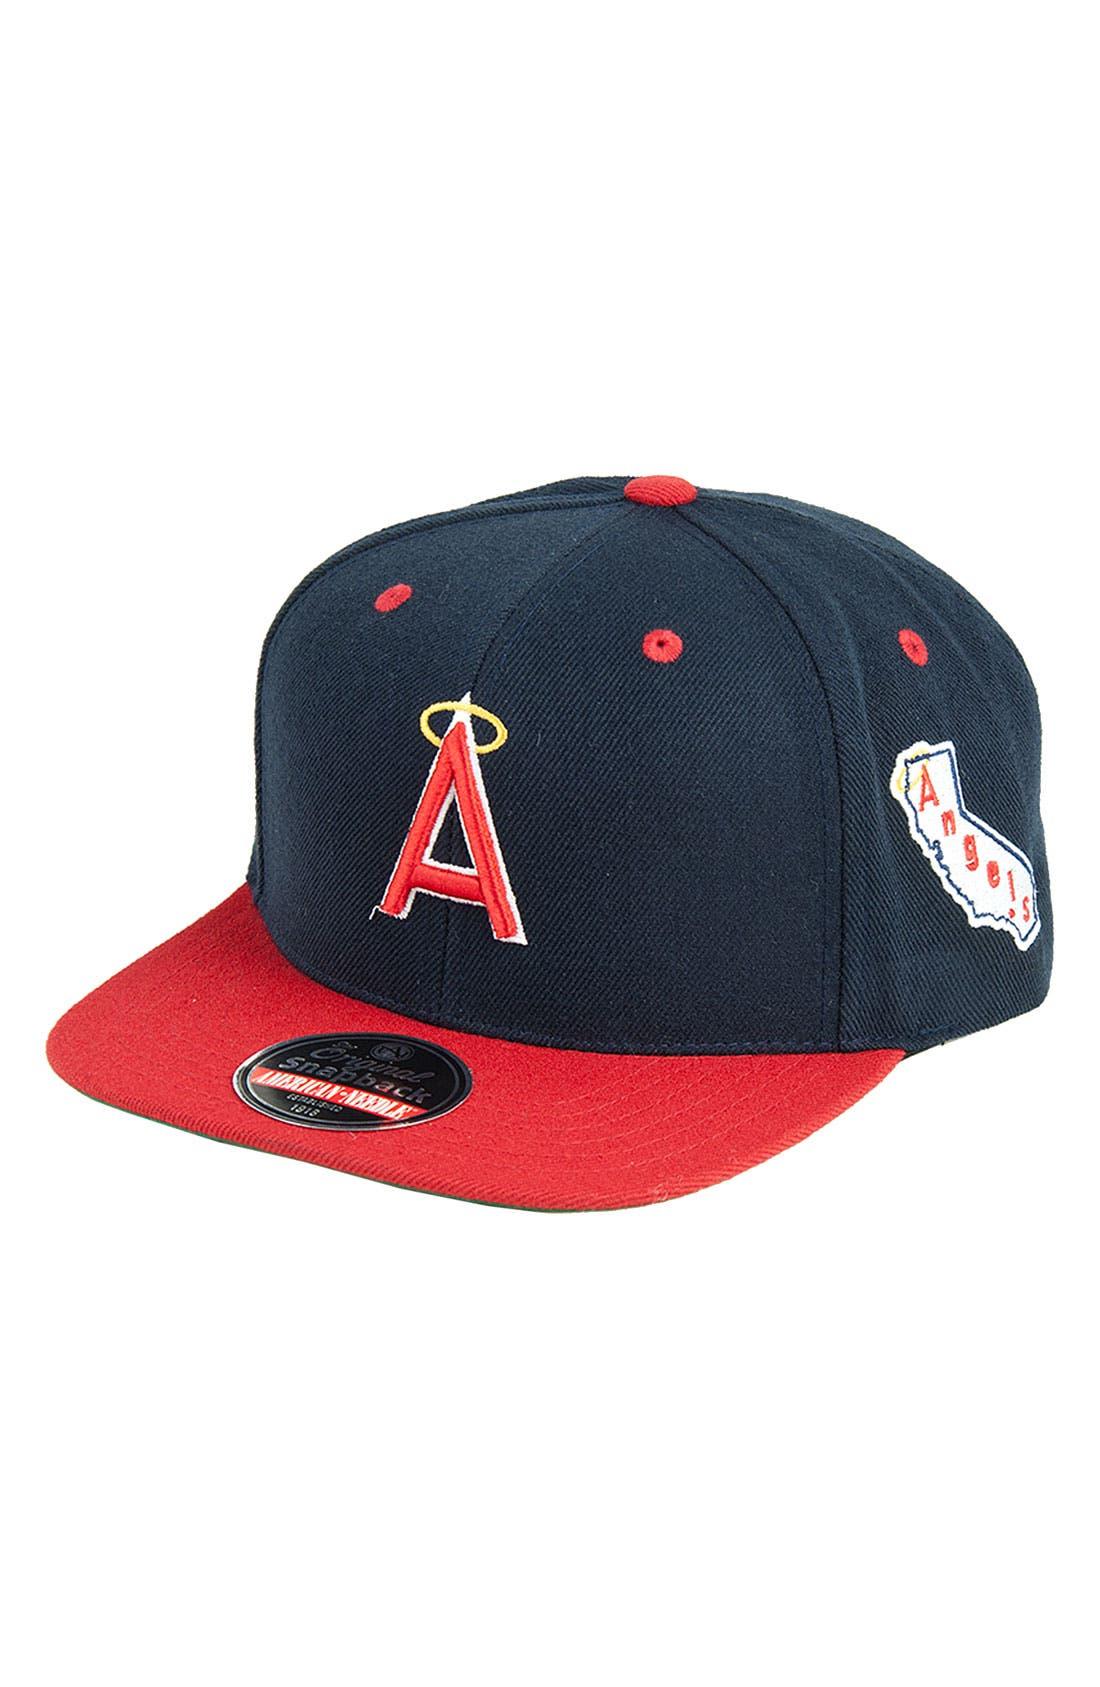 Alternate Image 1 Selected - American Needle 'Blockhead Angels' Snapback Baseball Cap